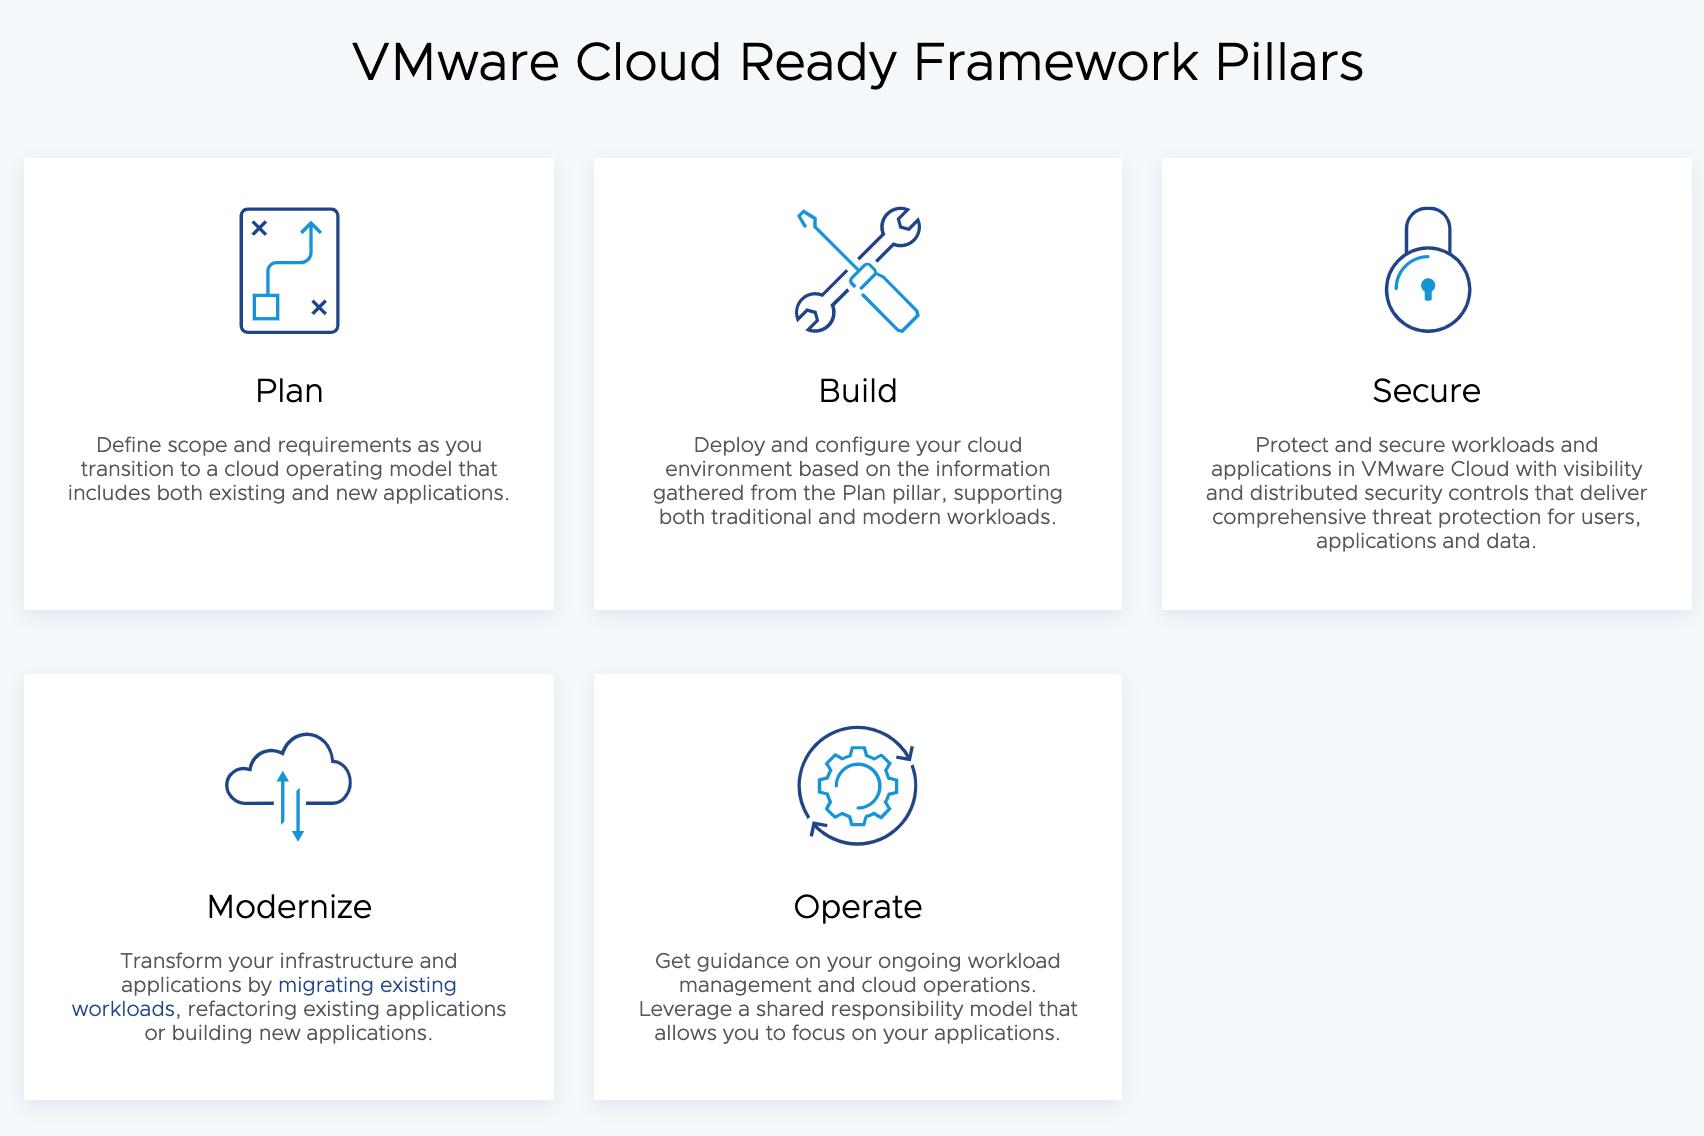 VMware Cloud Ready Framework